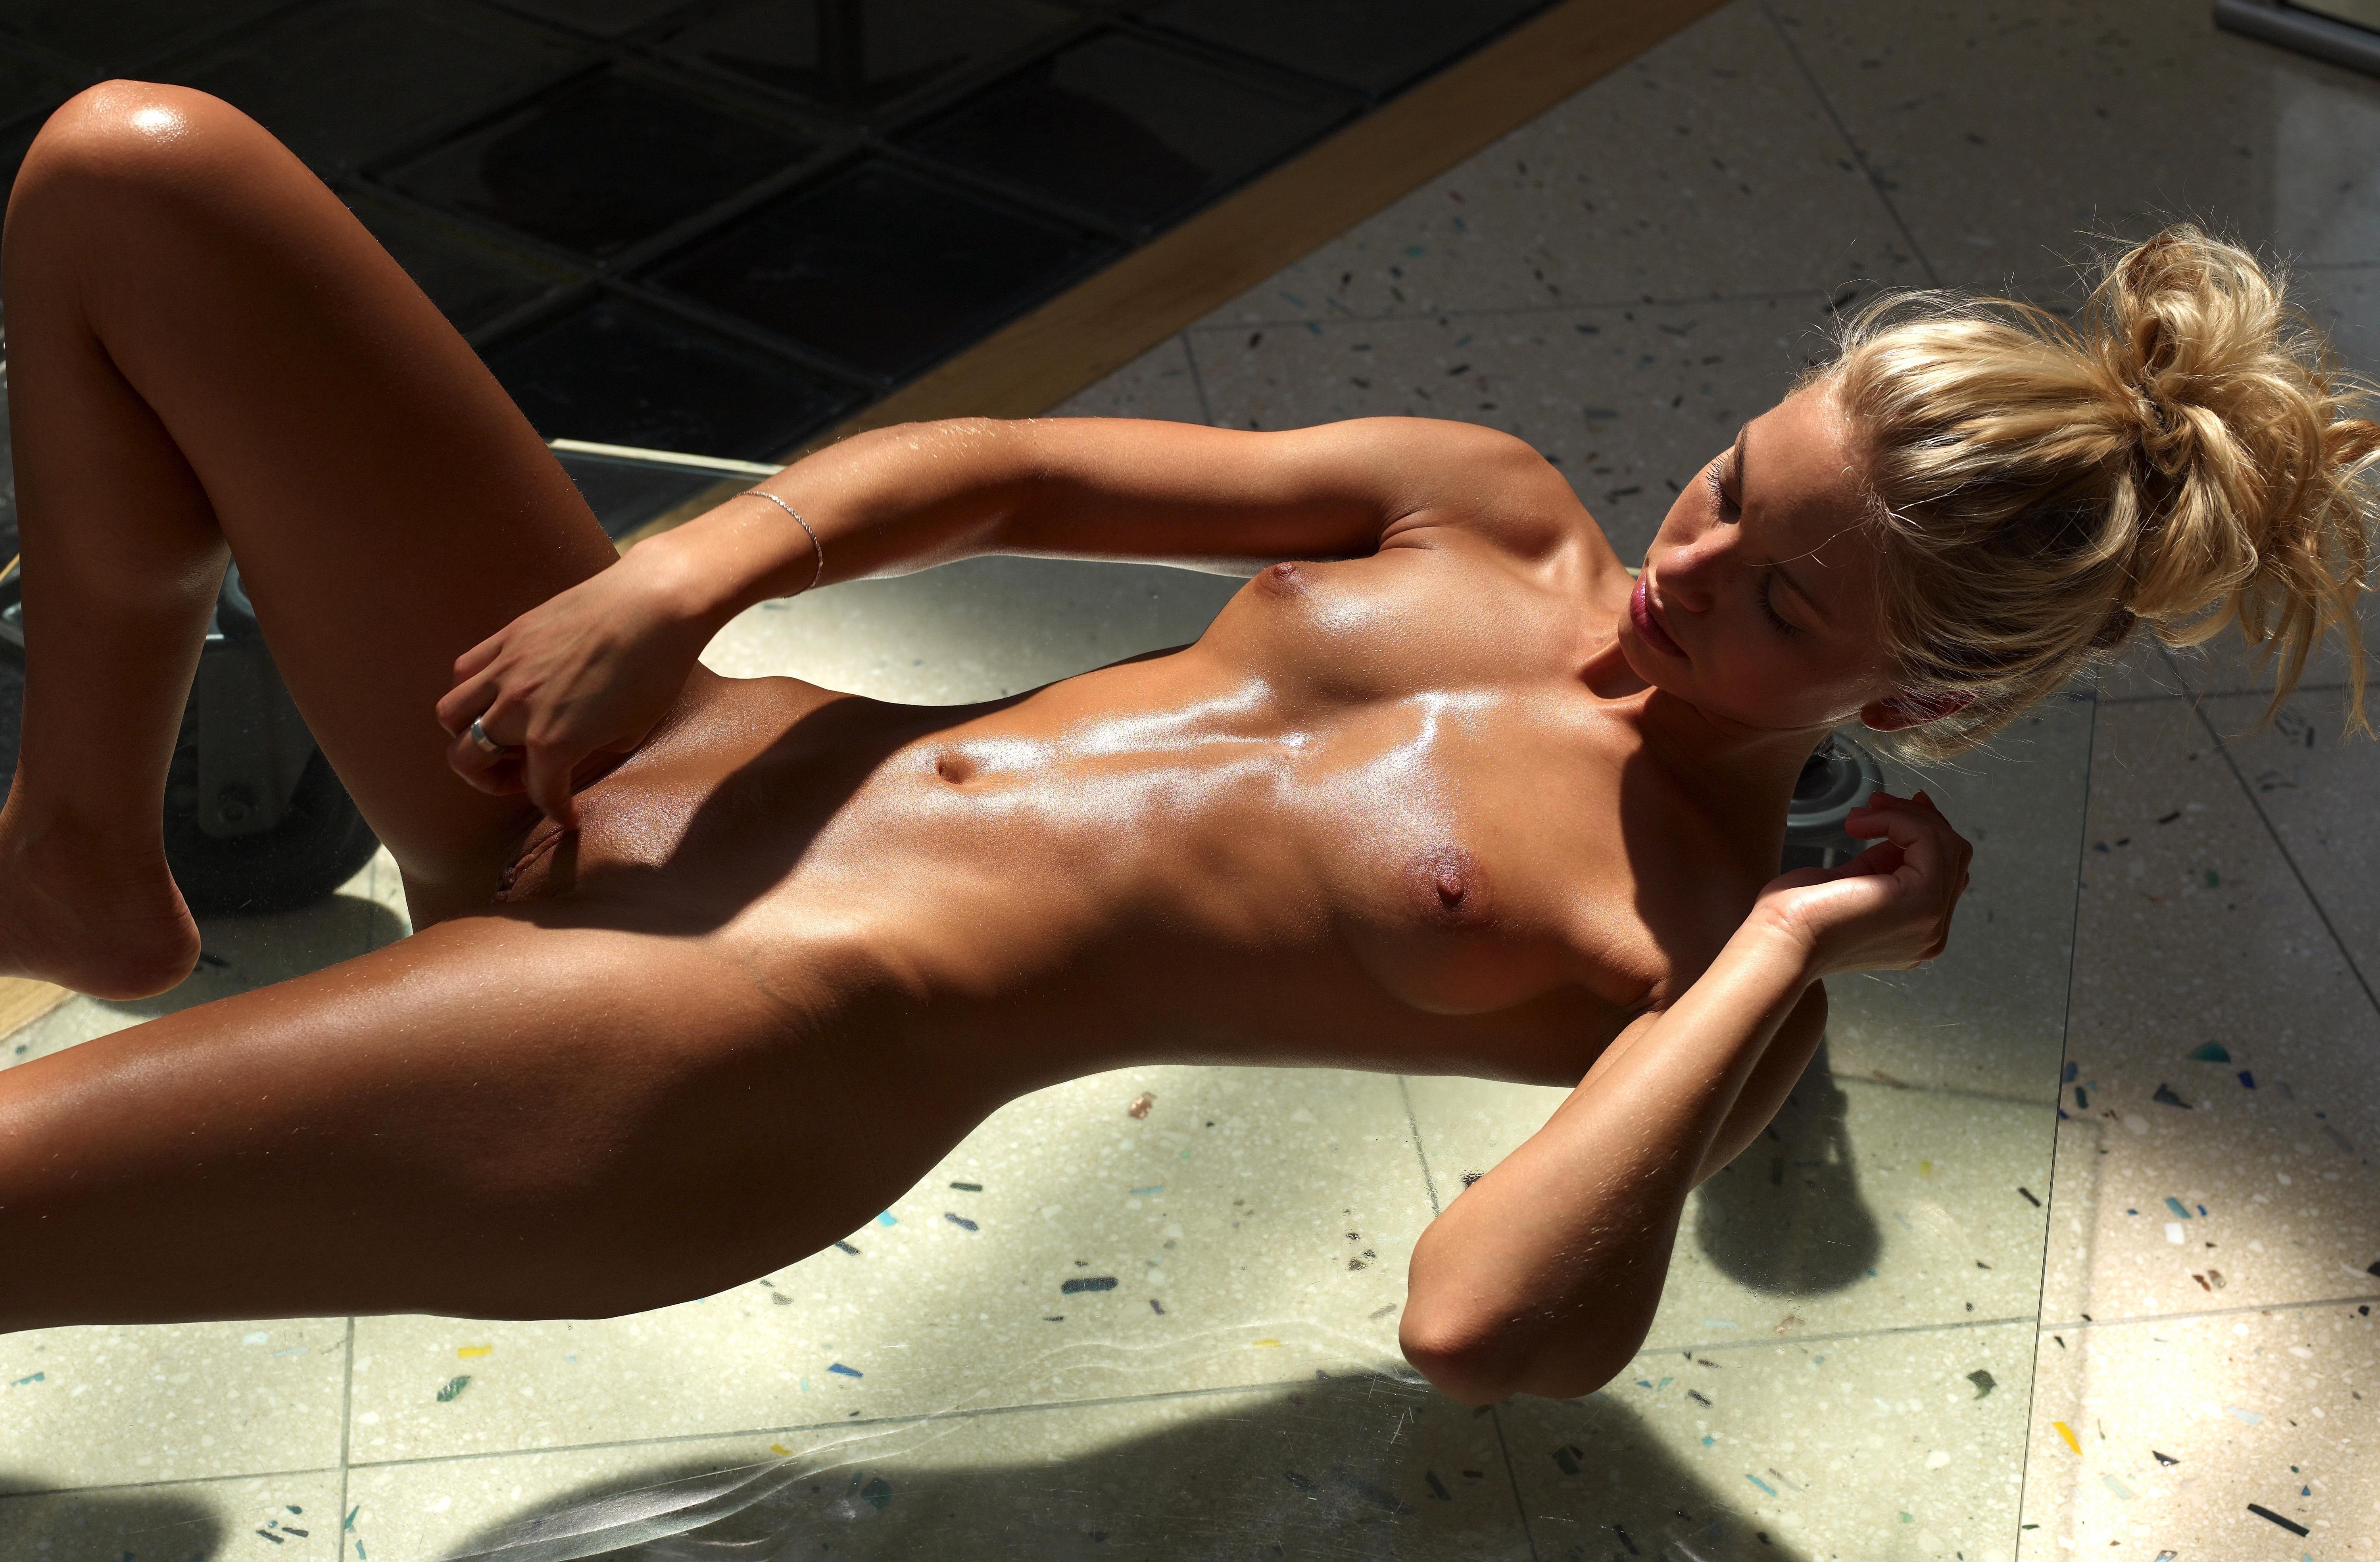 milf naked video forum